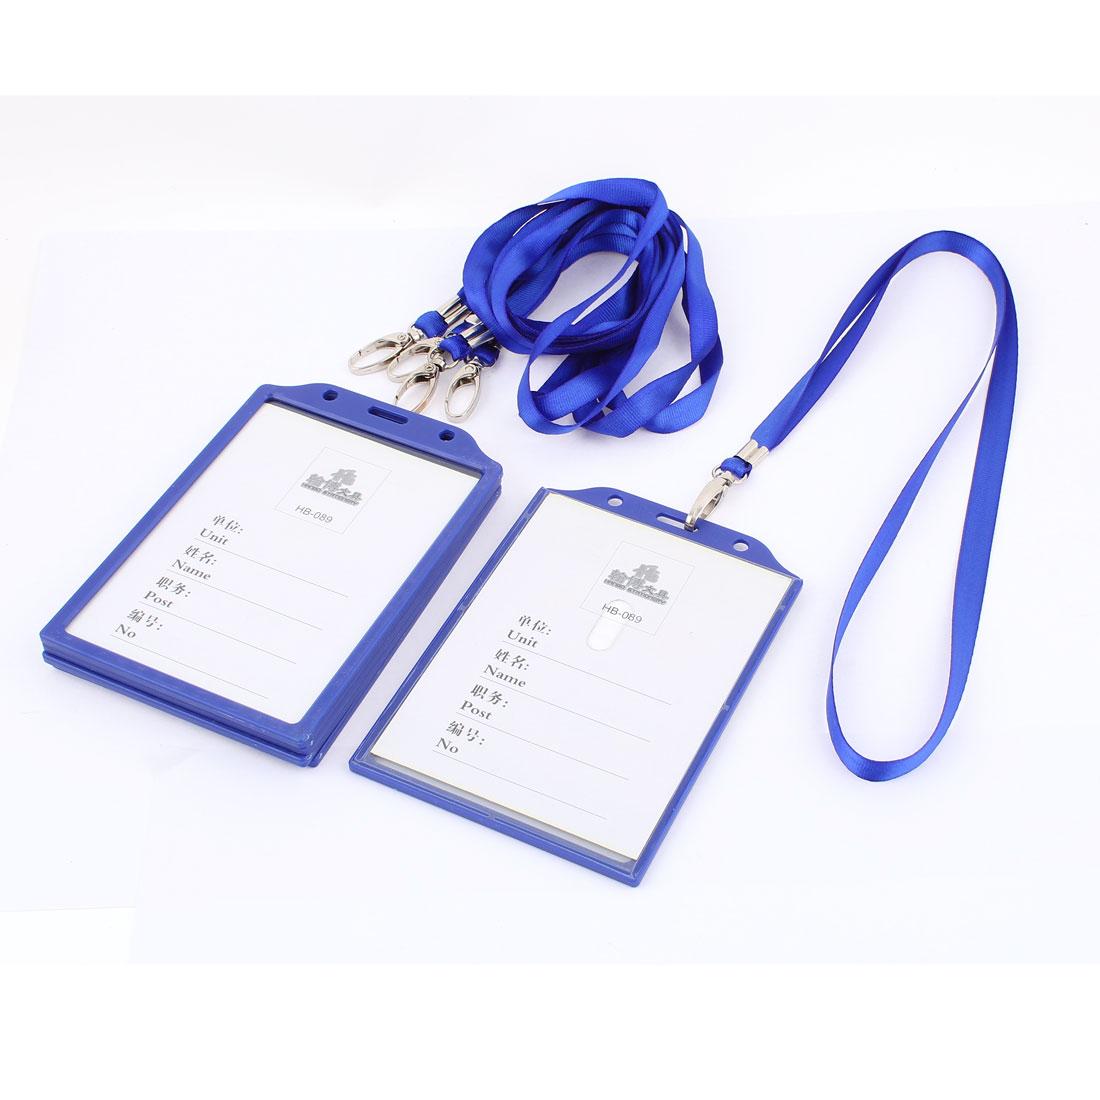 Office Plastic Vertical ID Work Card Badge Holder Neck Strap Lanyard Blue 5pcs